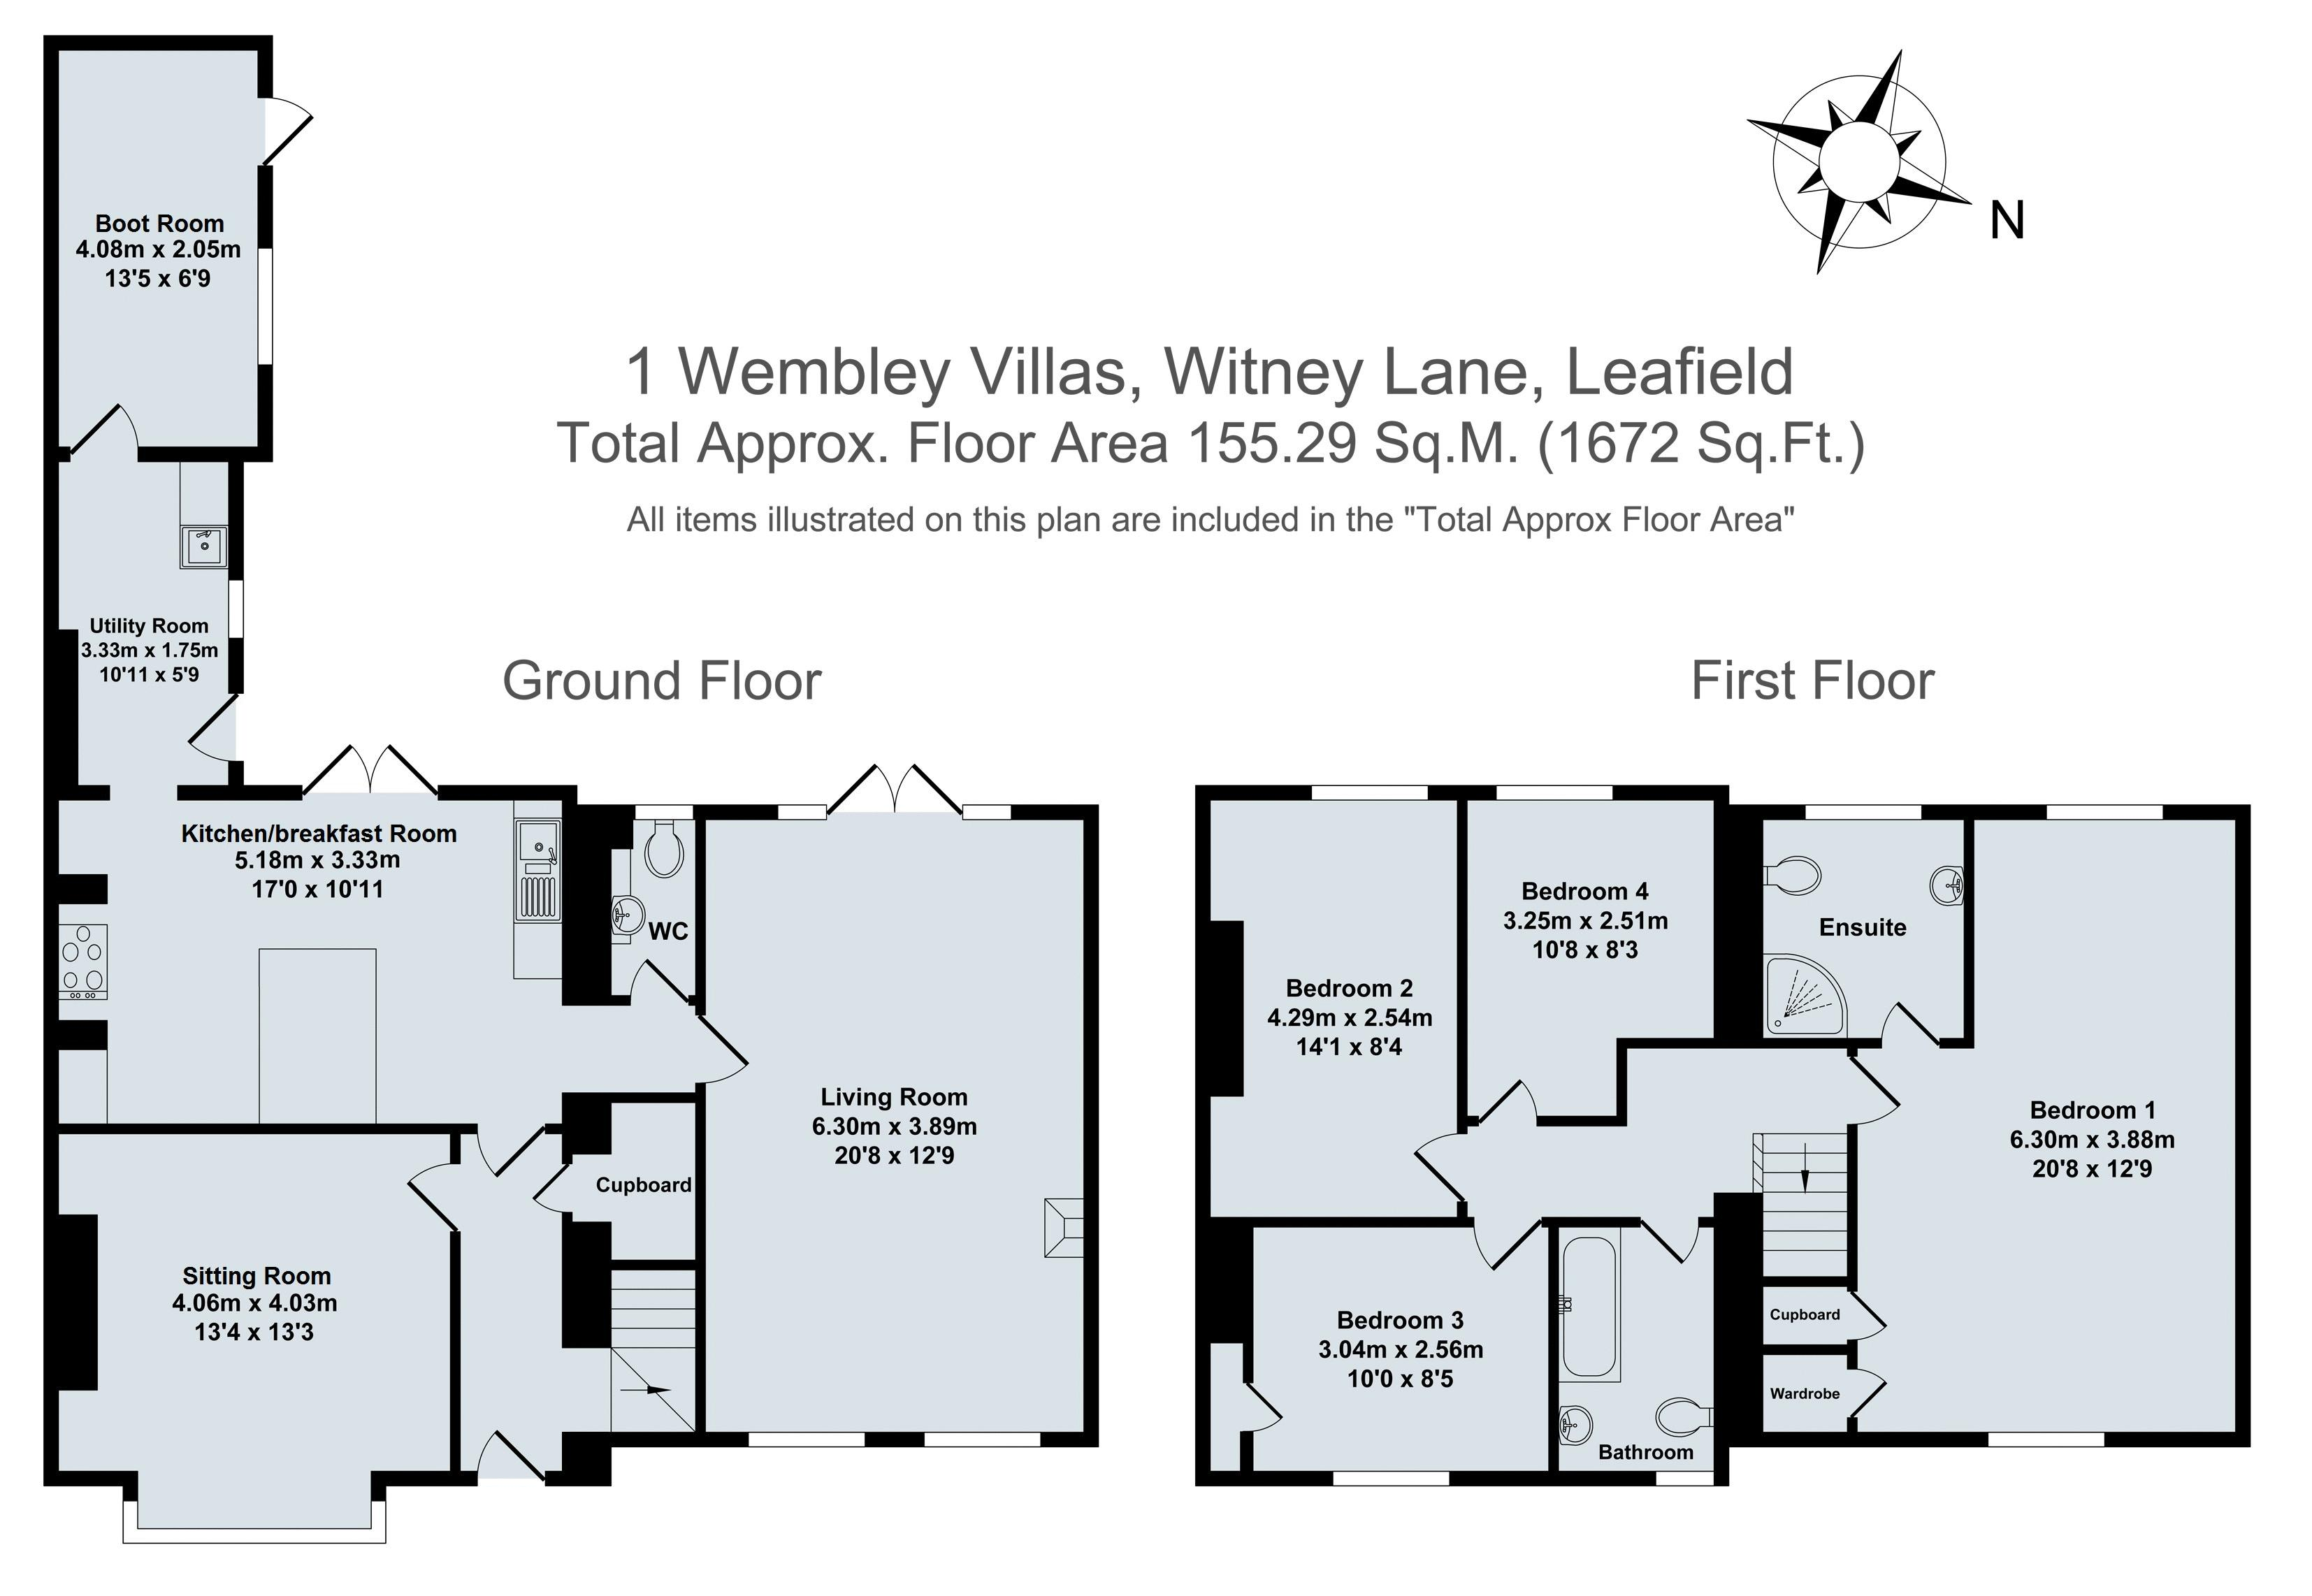 Wembley Villas, Witney Lane